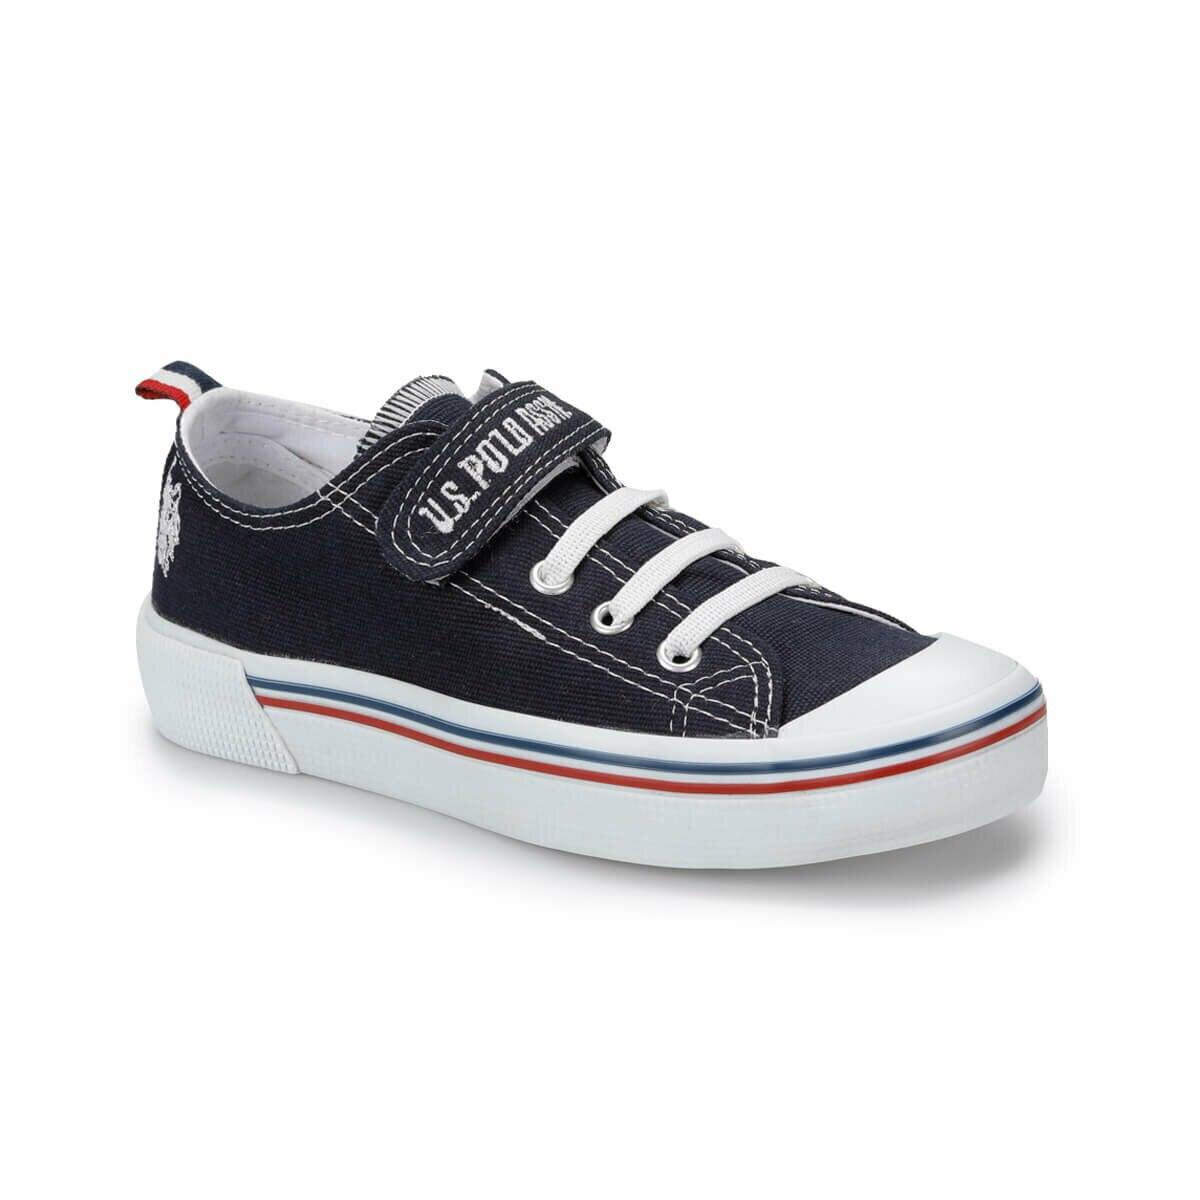 FLO PENELOPE Navy Blue Unisex Children Sneaker Shoes U.S. POLO ASSN.